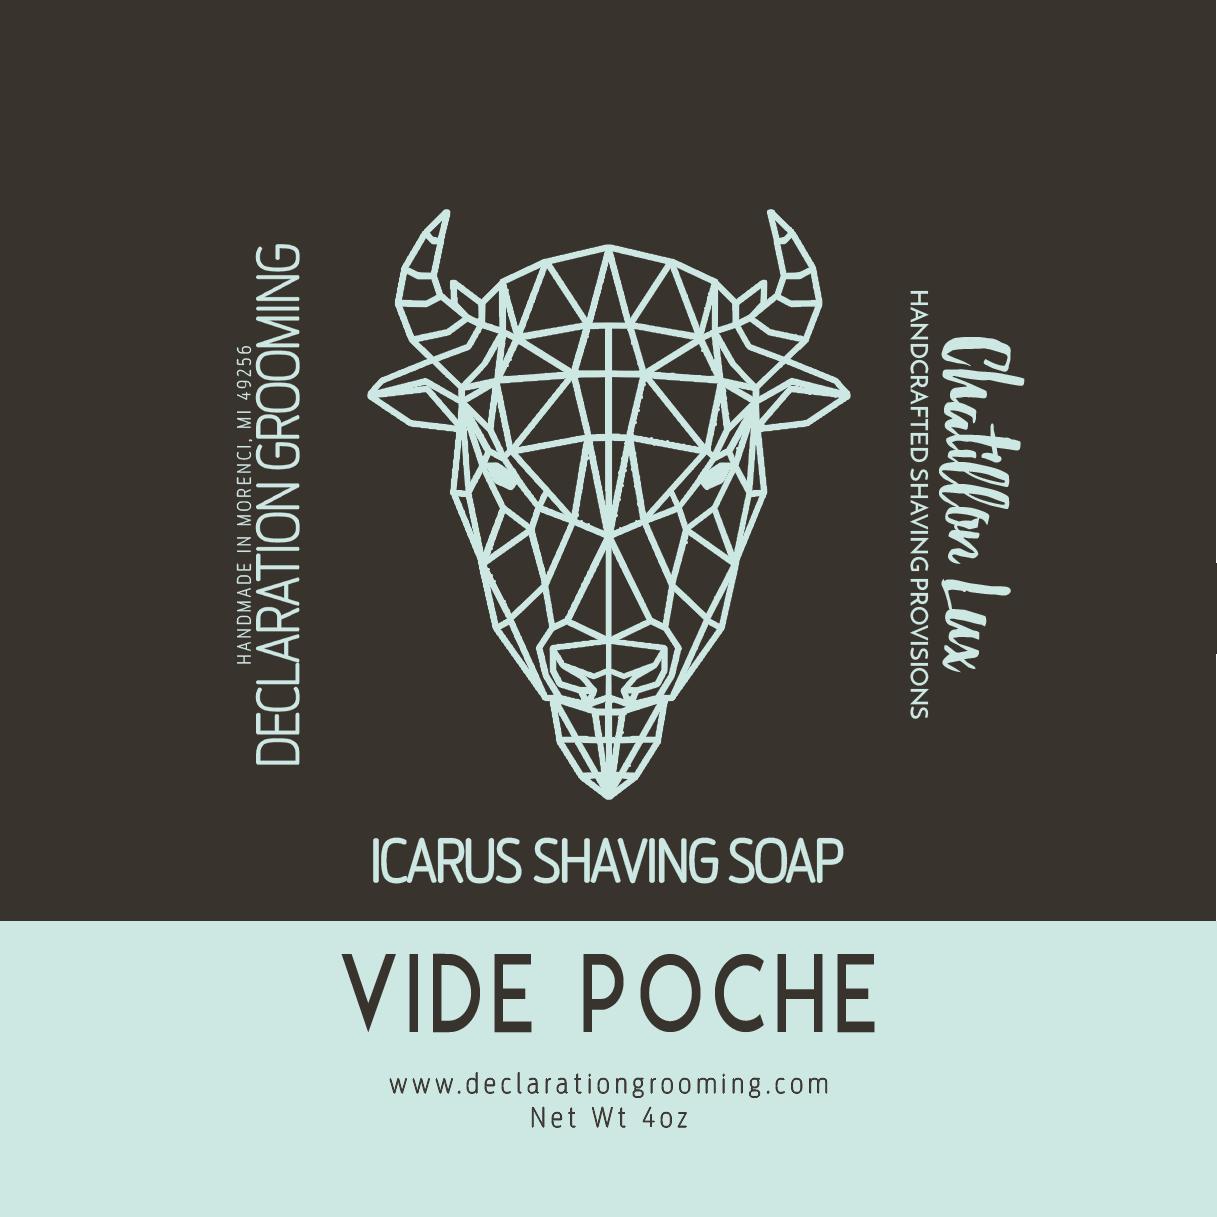 Chatillon Lux/Declaration Grooming - Vide Poche - Soap (LE) image